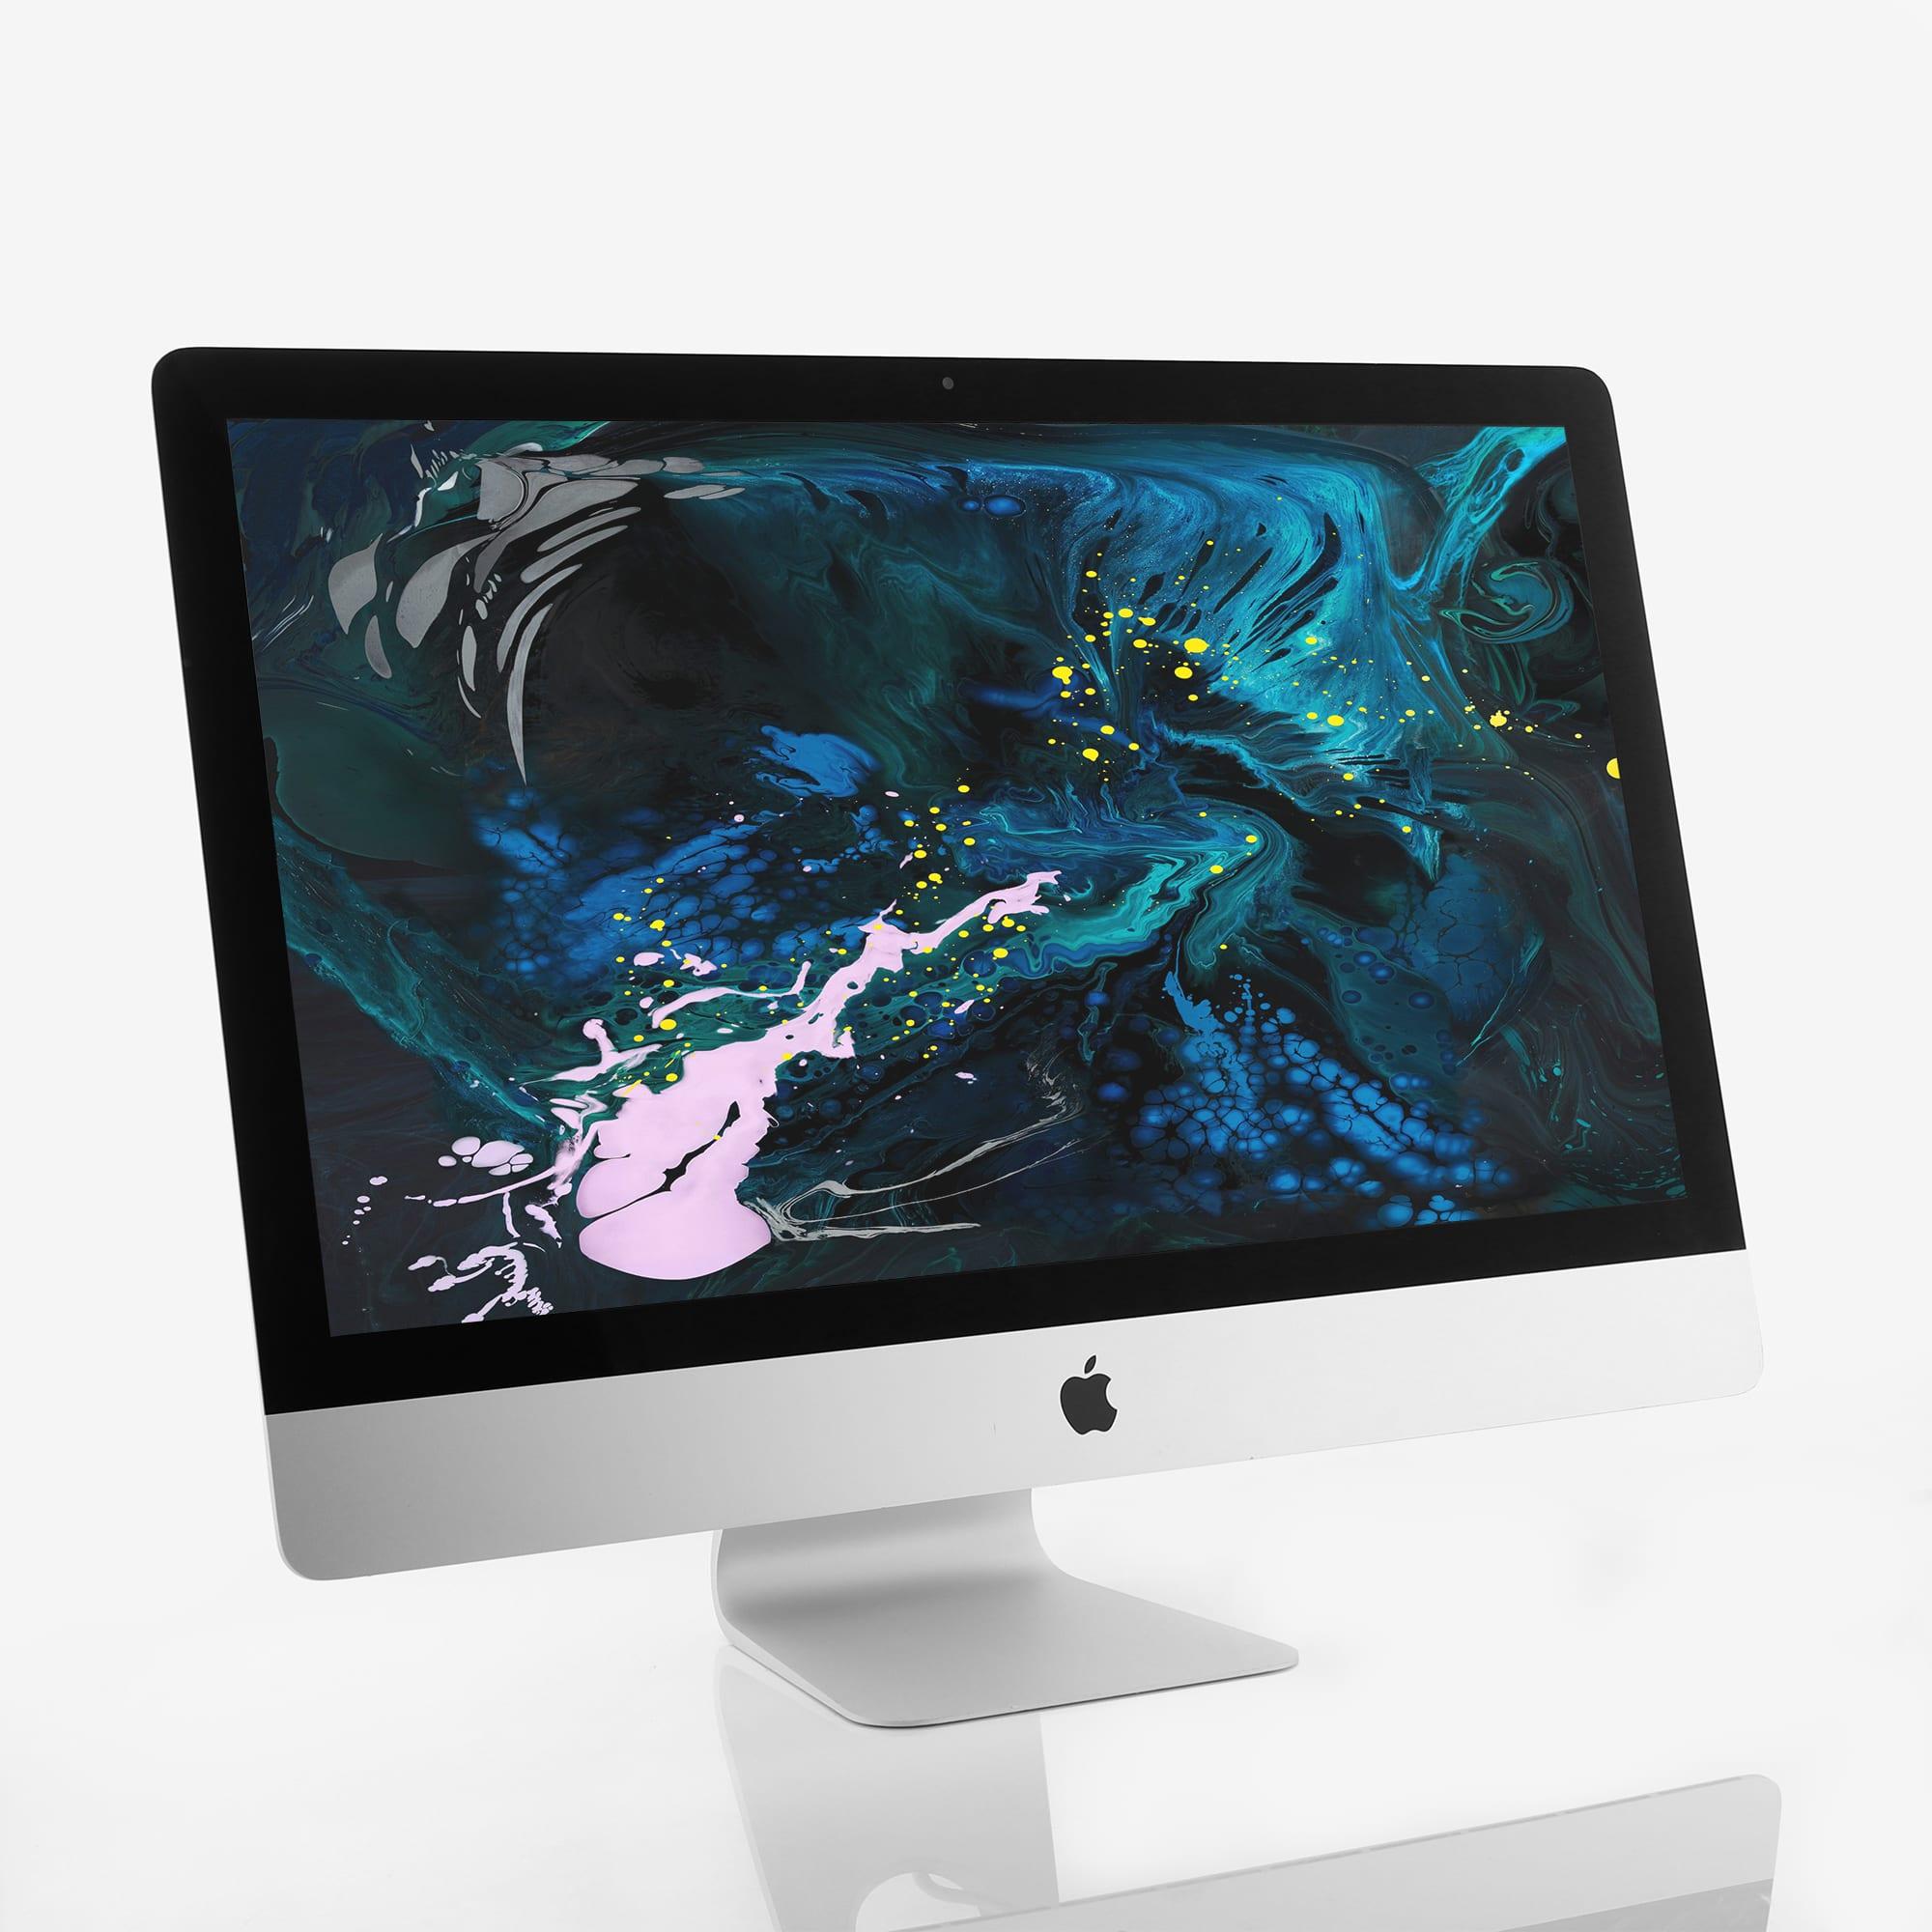 1 x Apple iMac Slim 27 Inch 5K Retina Quad Core i5 3.50 GHz (2017)